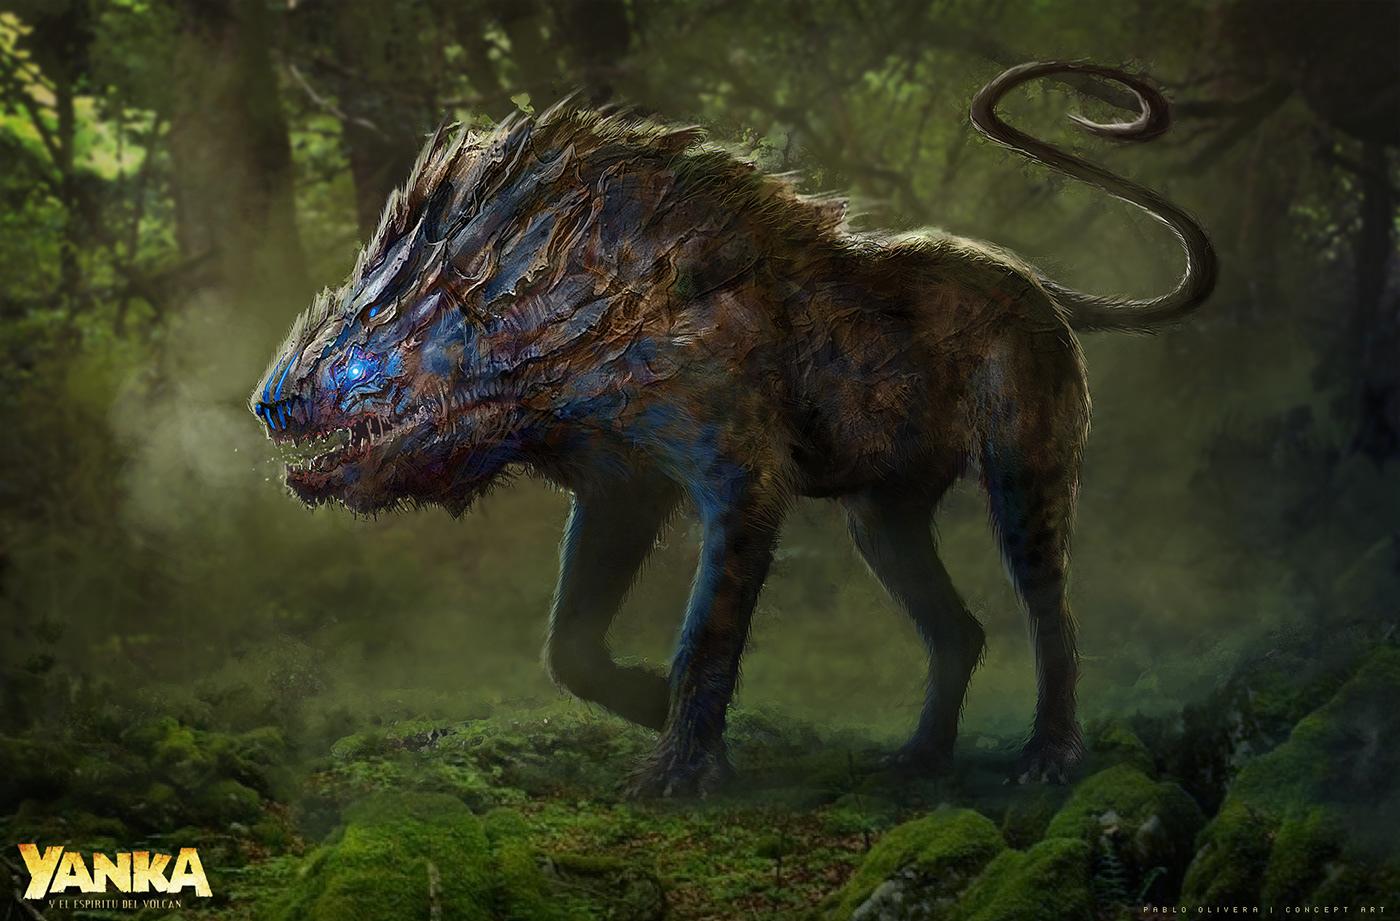 Creature design - YANKA (movie 2018) on Behance